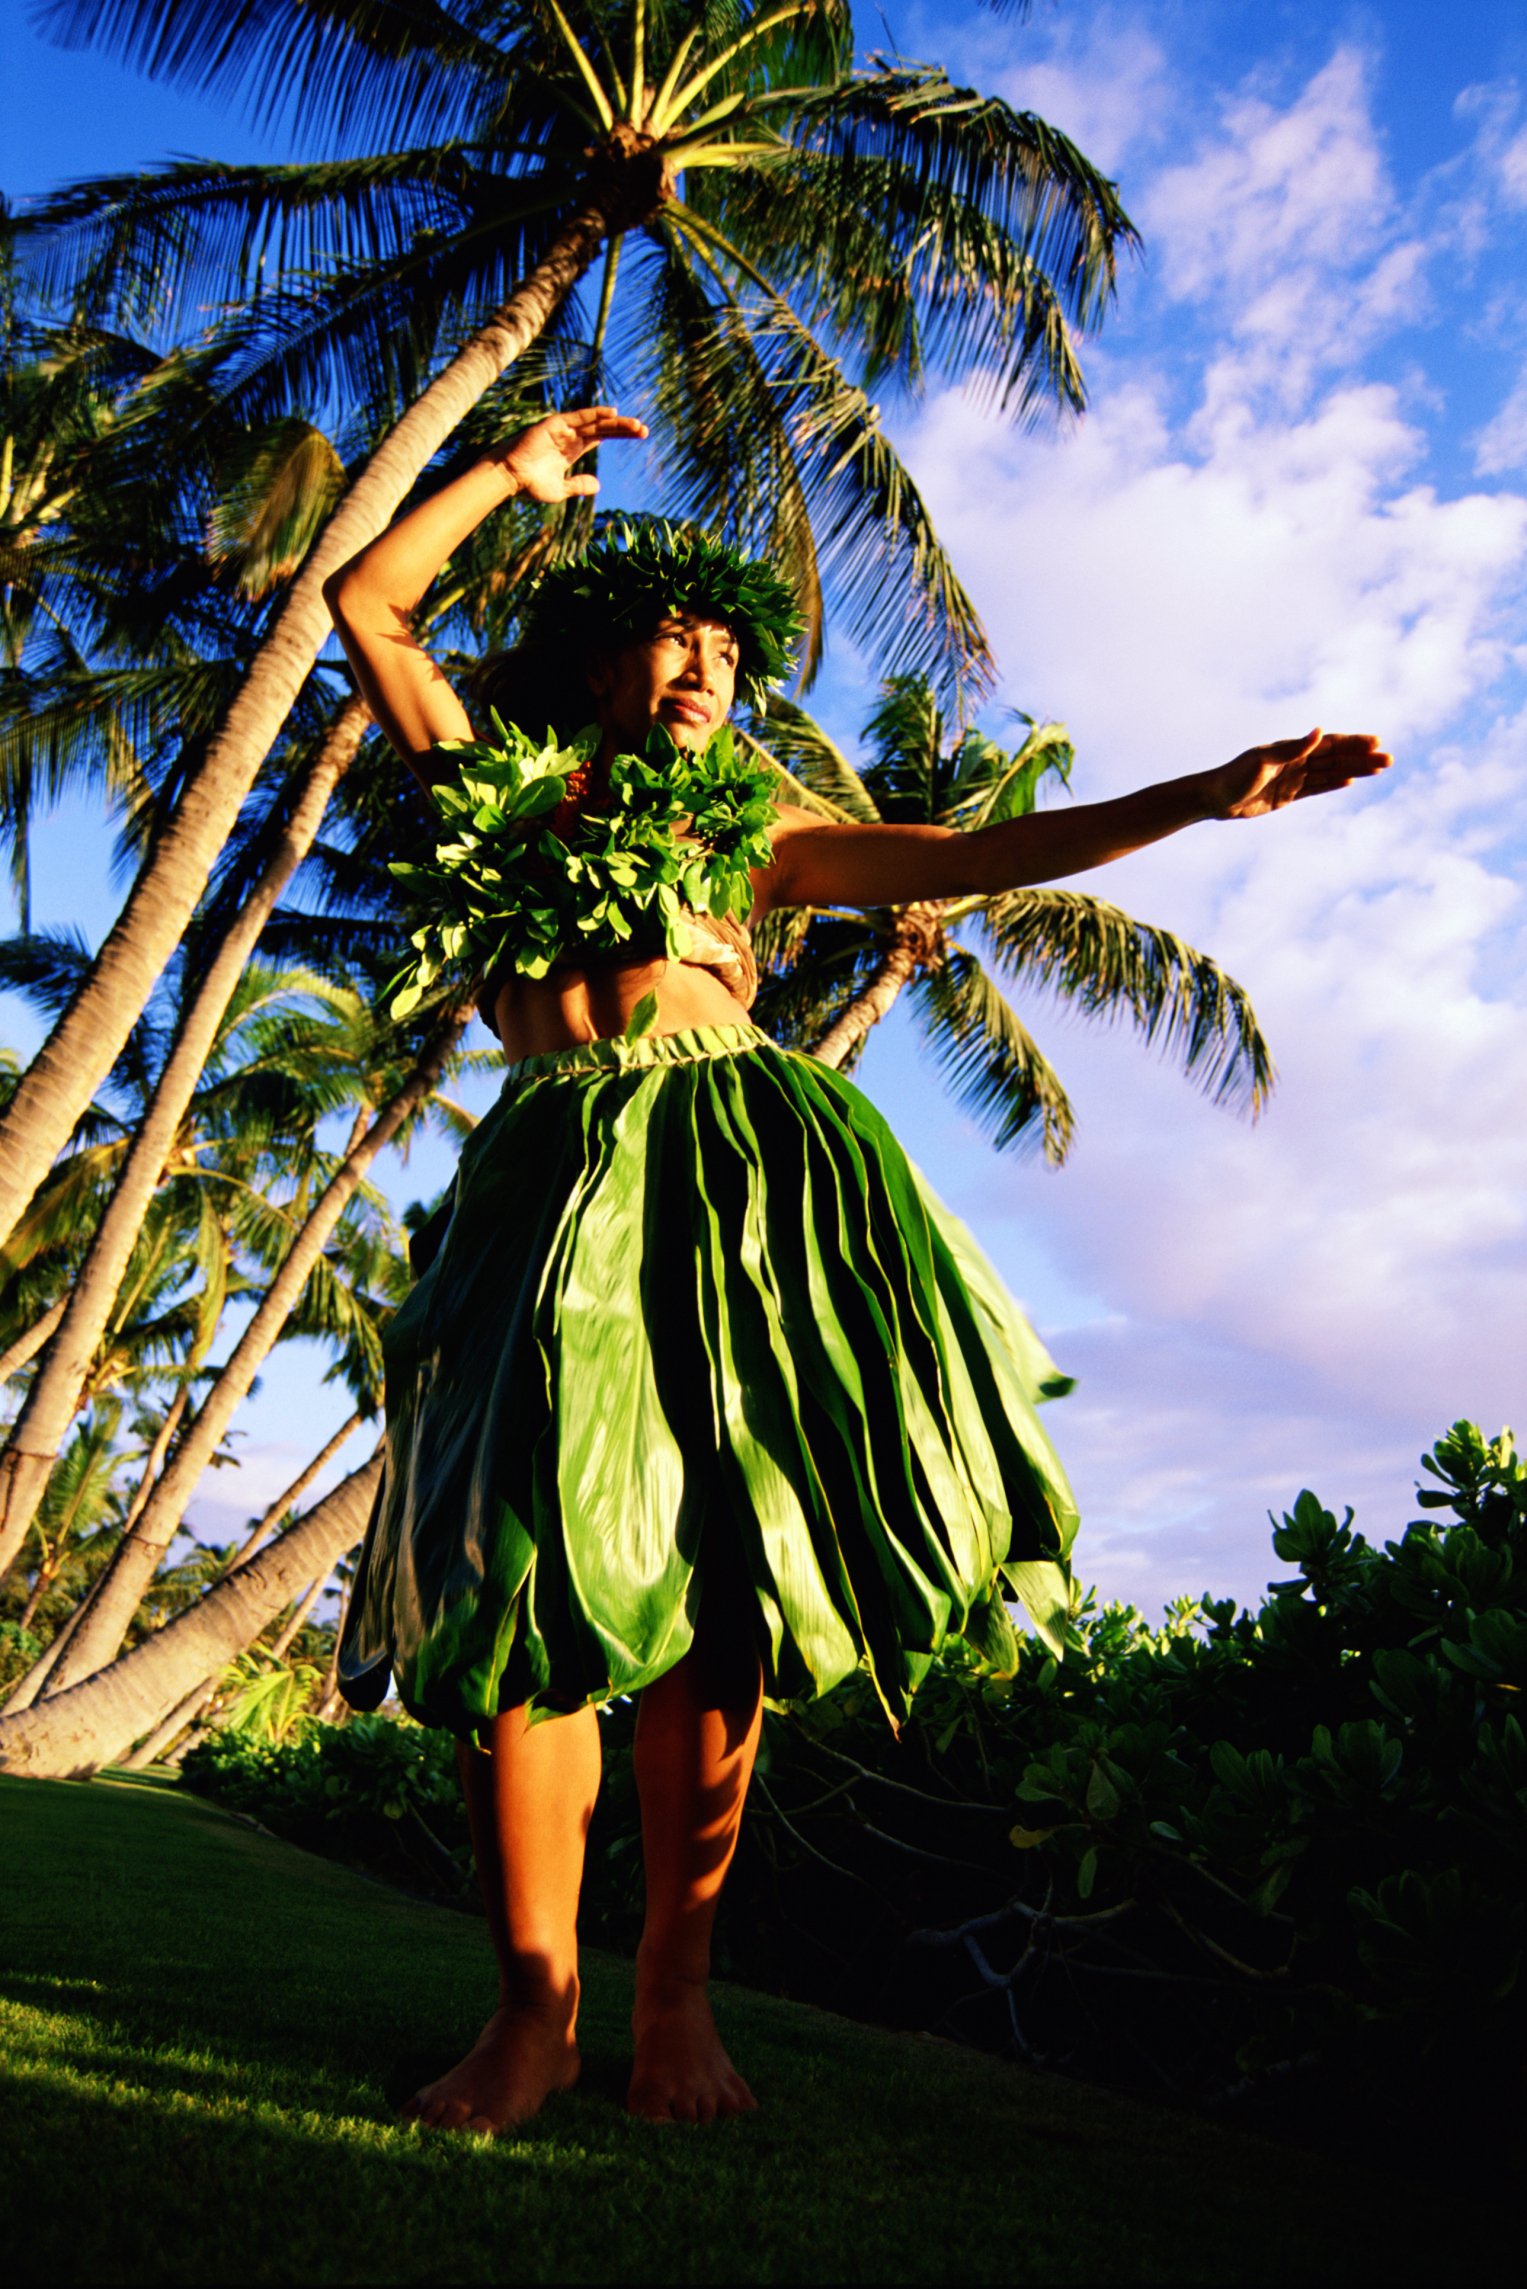 & How Do the Hula Girls Dress in Hawaii? | LIVESTRONG.COM